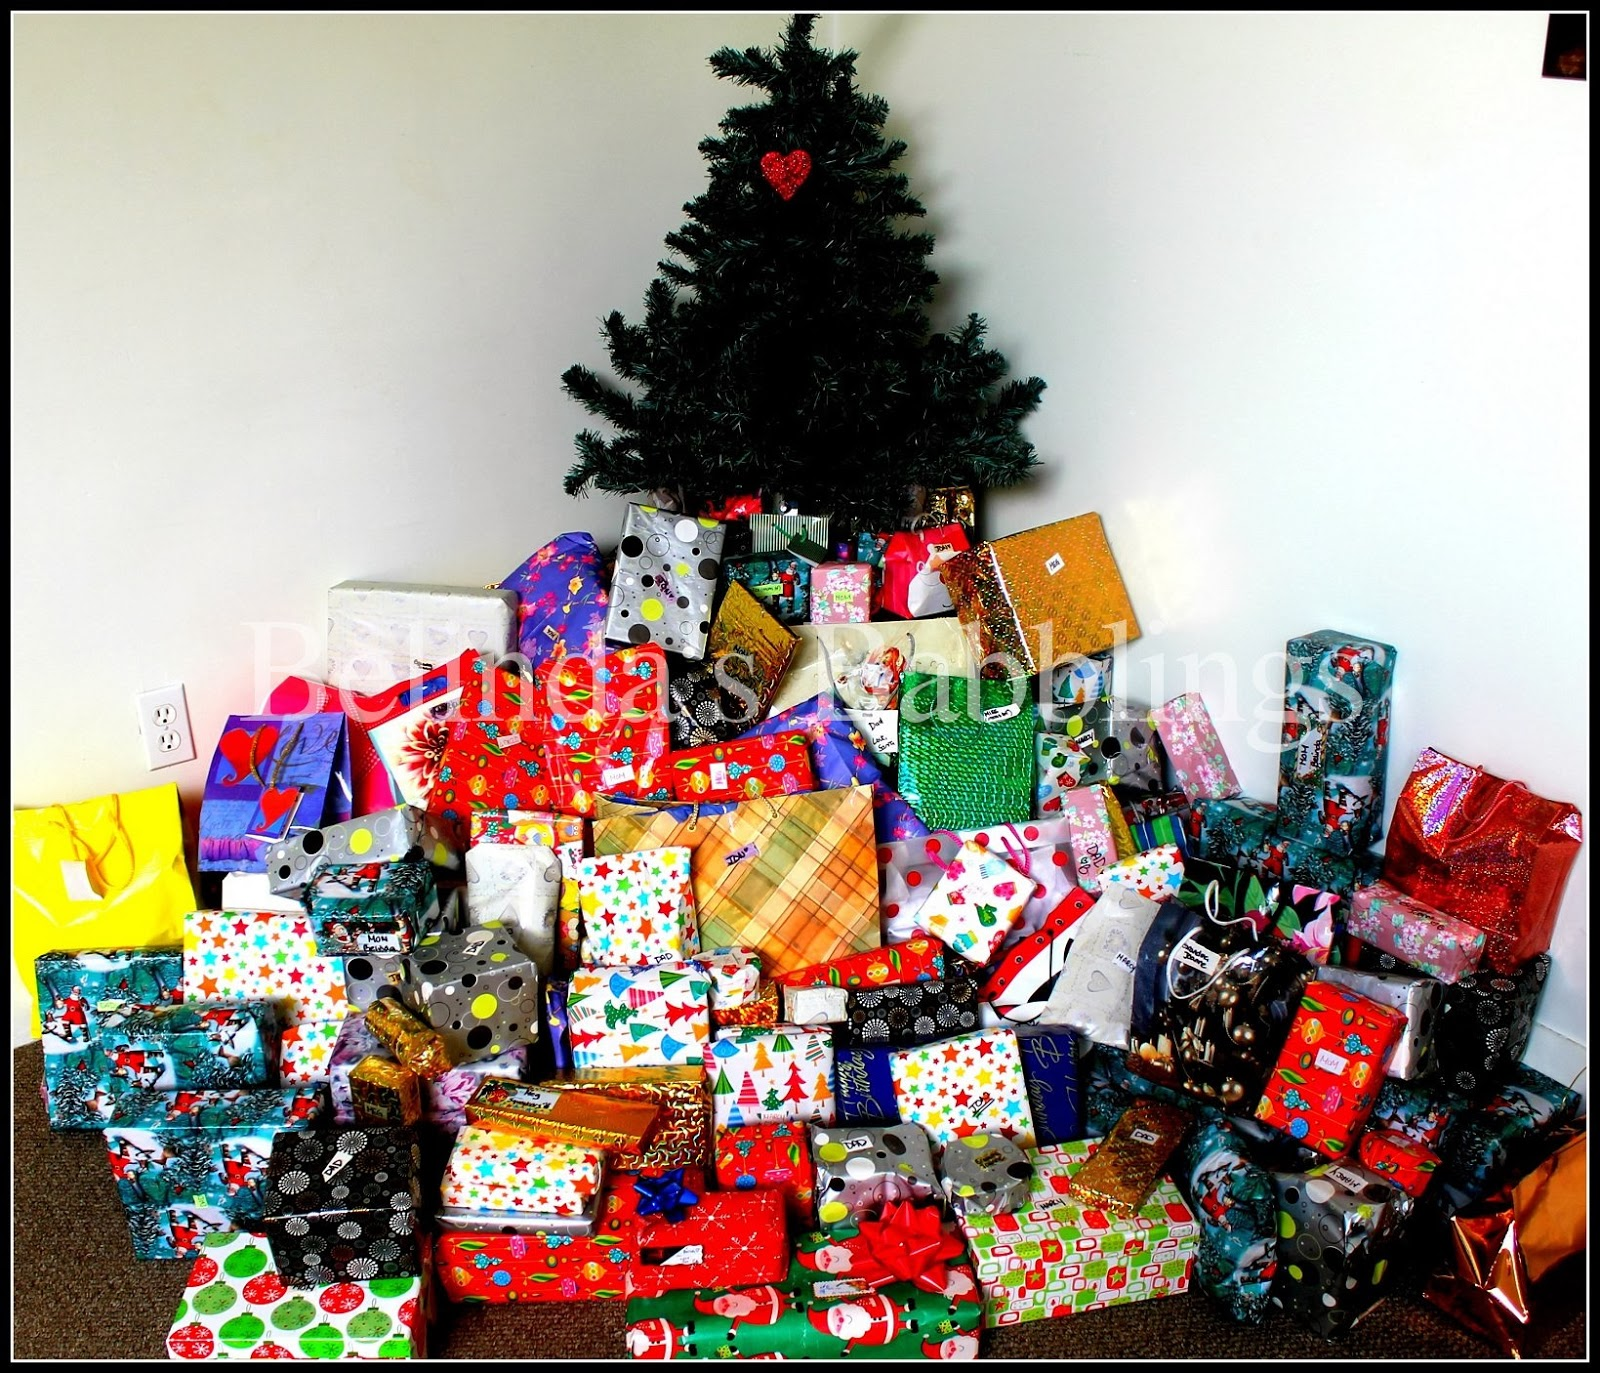 Watermarked Christmas Tree Presents